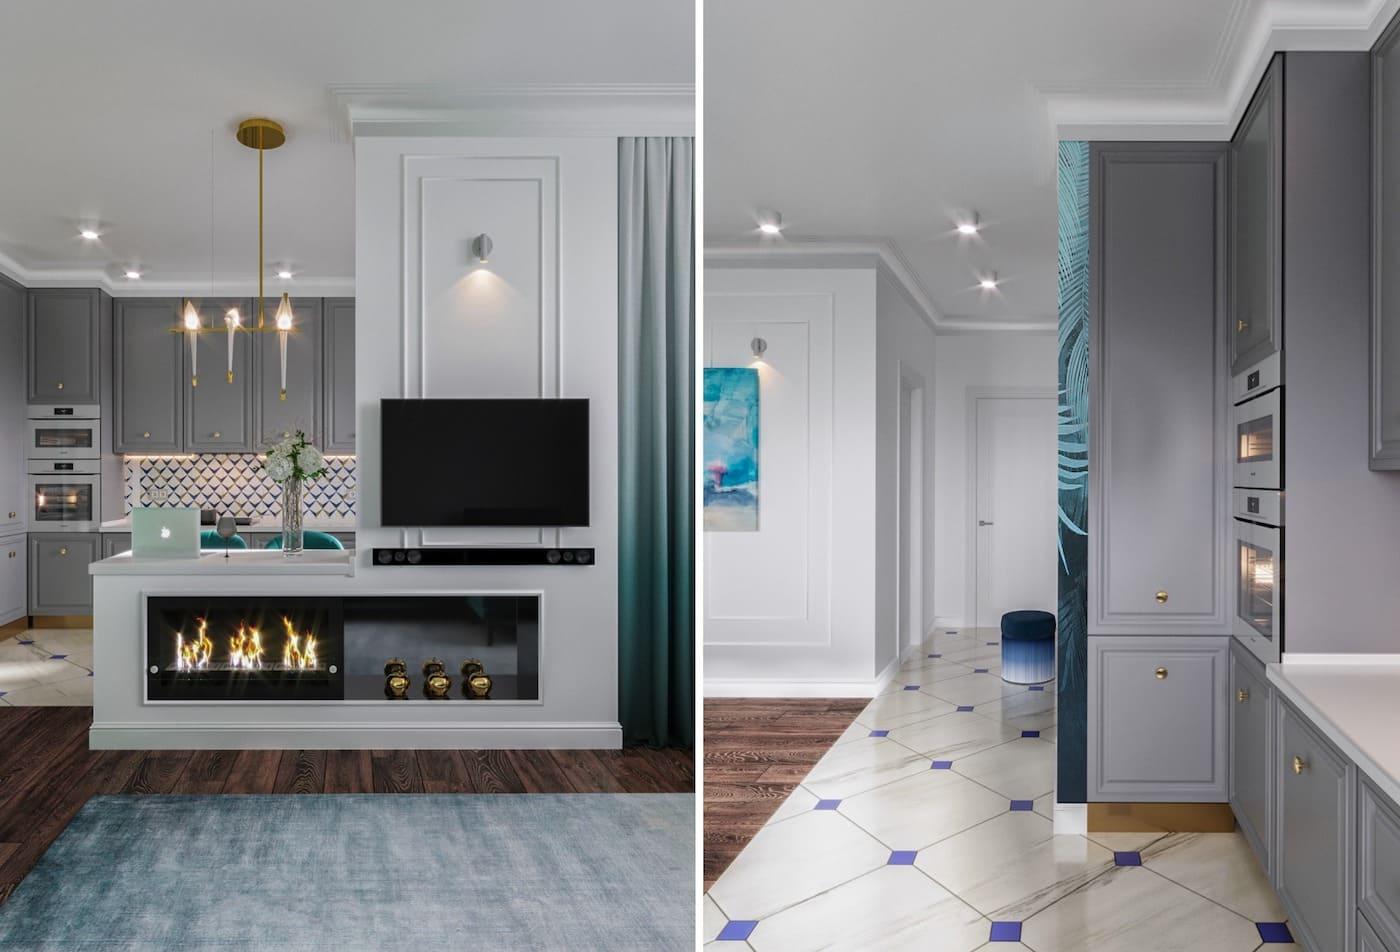 дизайн интерьера модной квартиры фото 33